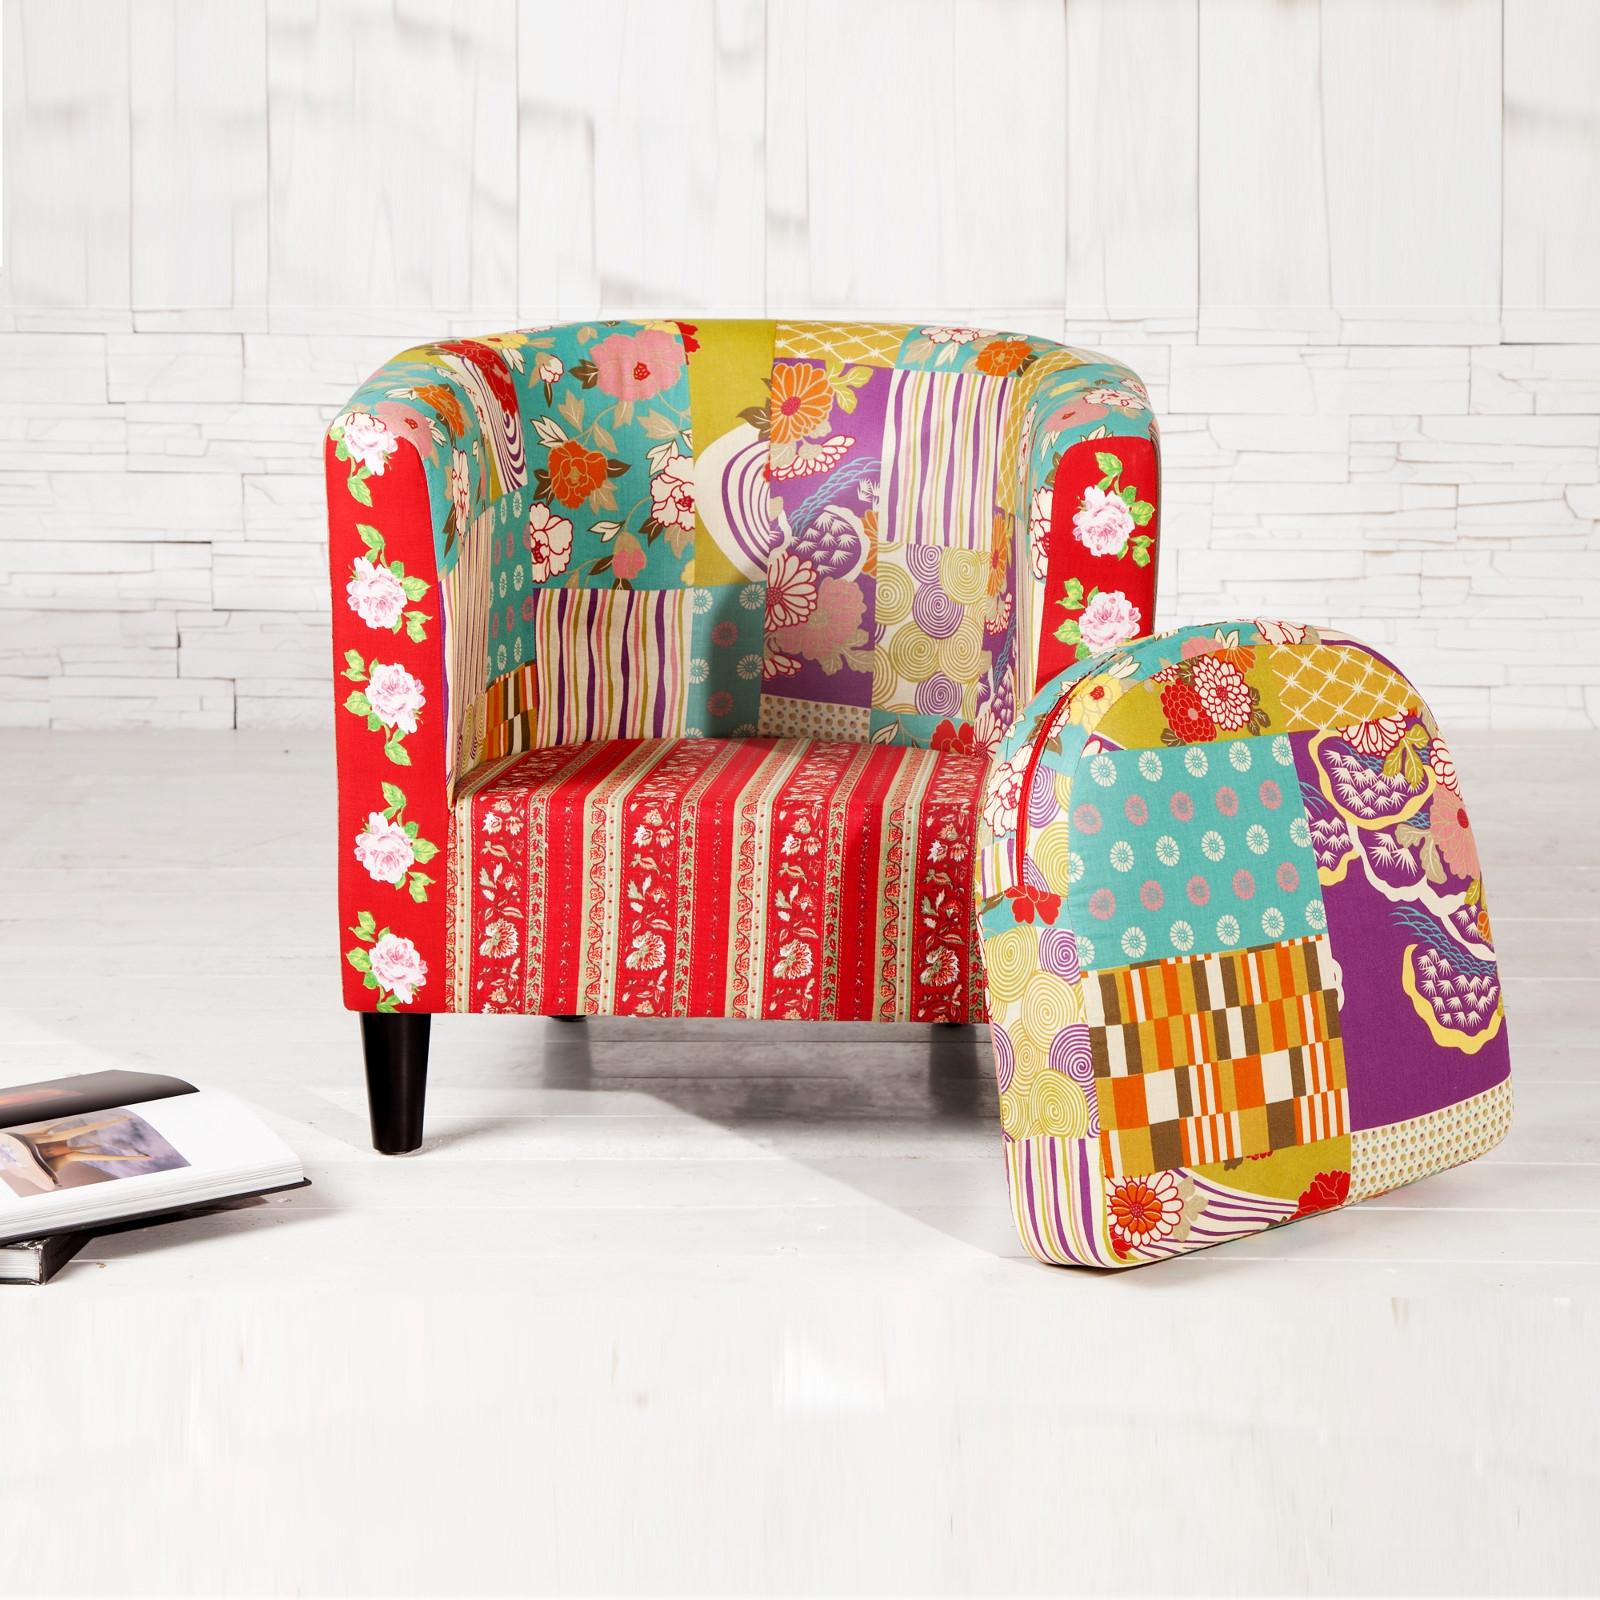 clubsessel floral patchwork wohnzimmer sessel fr hlich bunt gemustert ebay. Black Bedroom Furniture Sets. Home Design Ideas